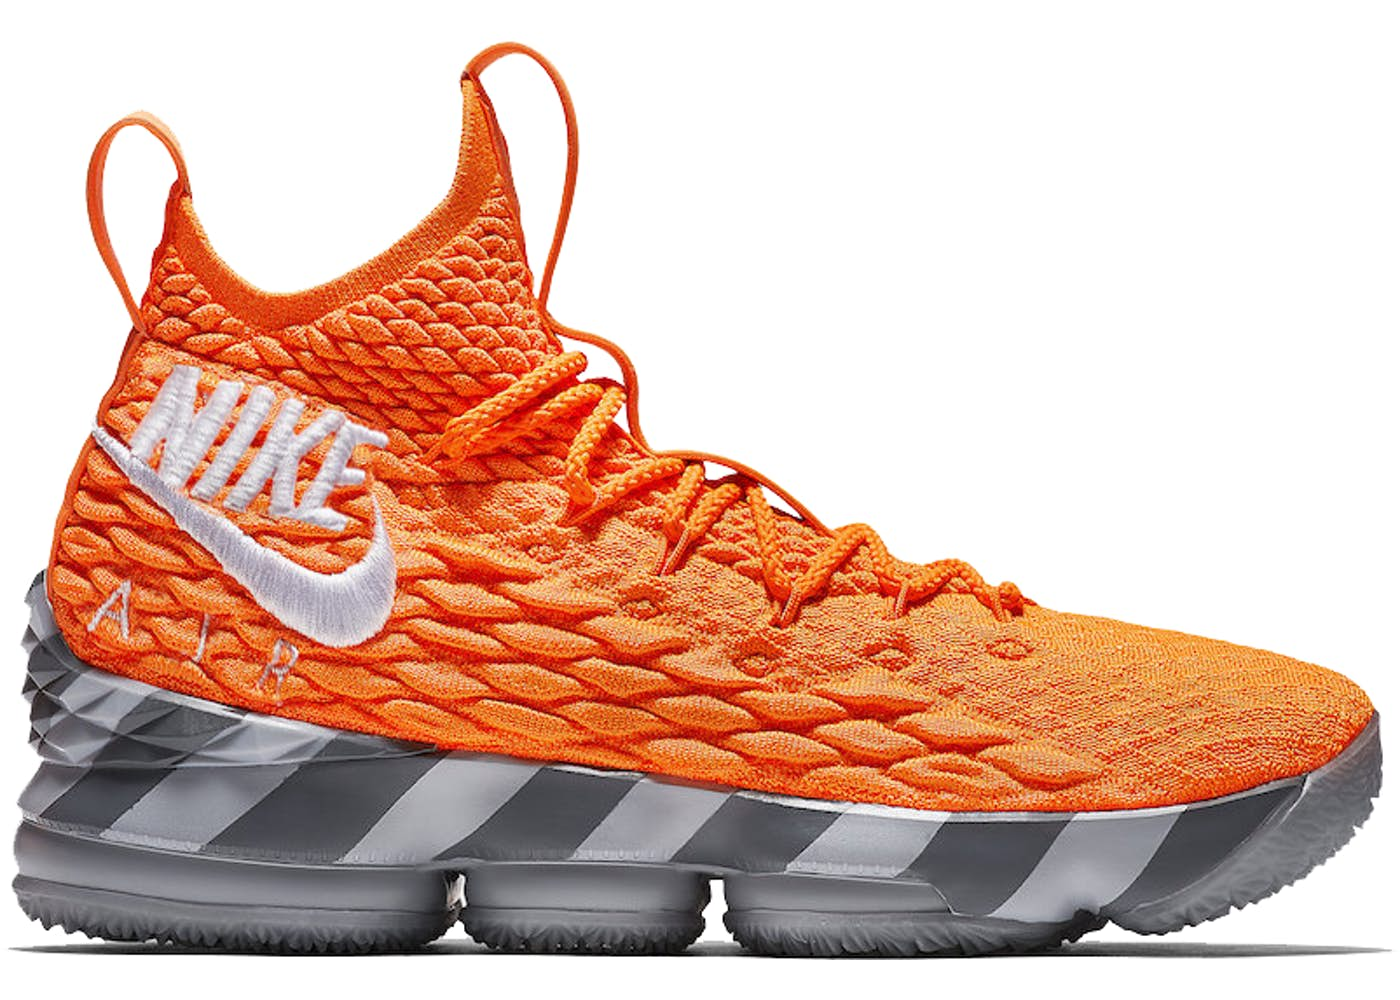 finest selection 91713 d7422 Nike LeBron 15 Orange Box